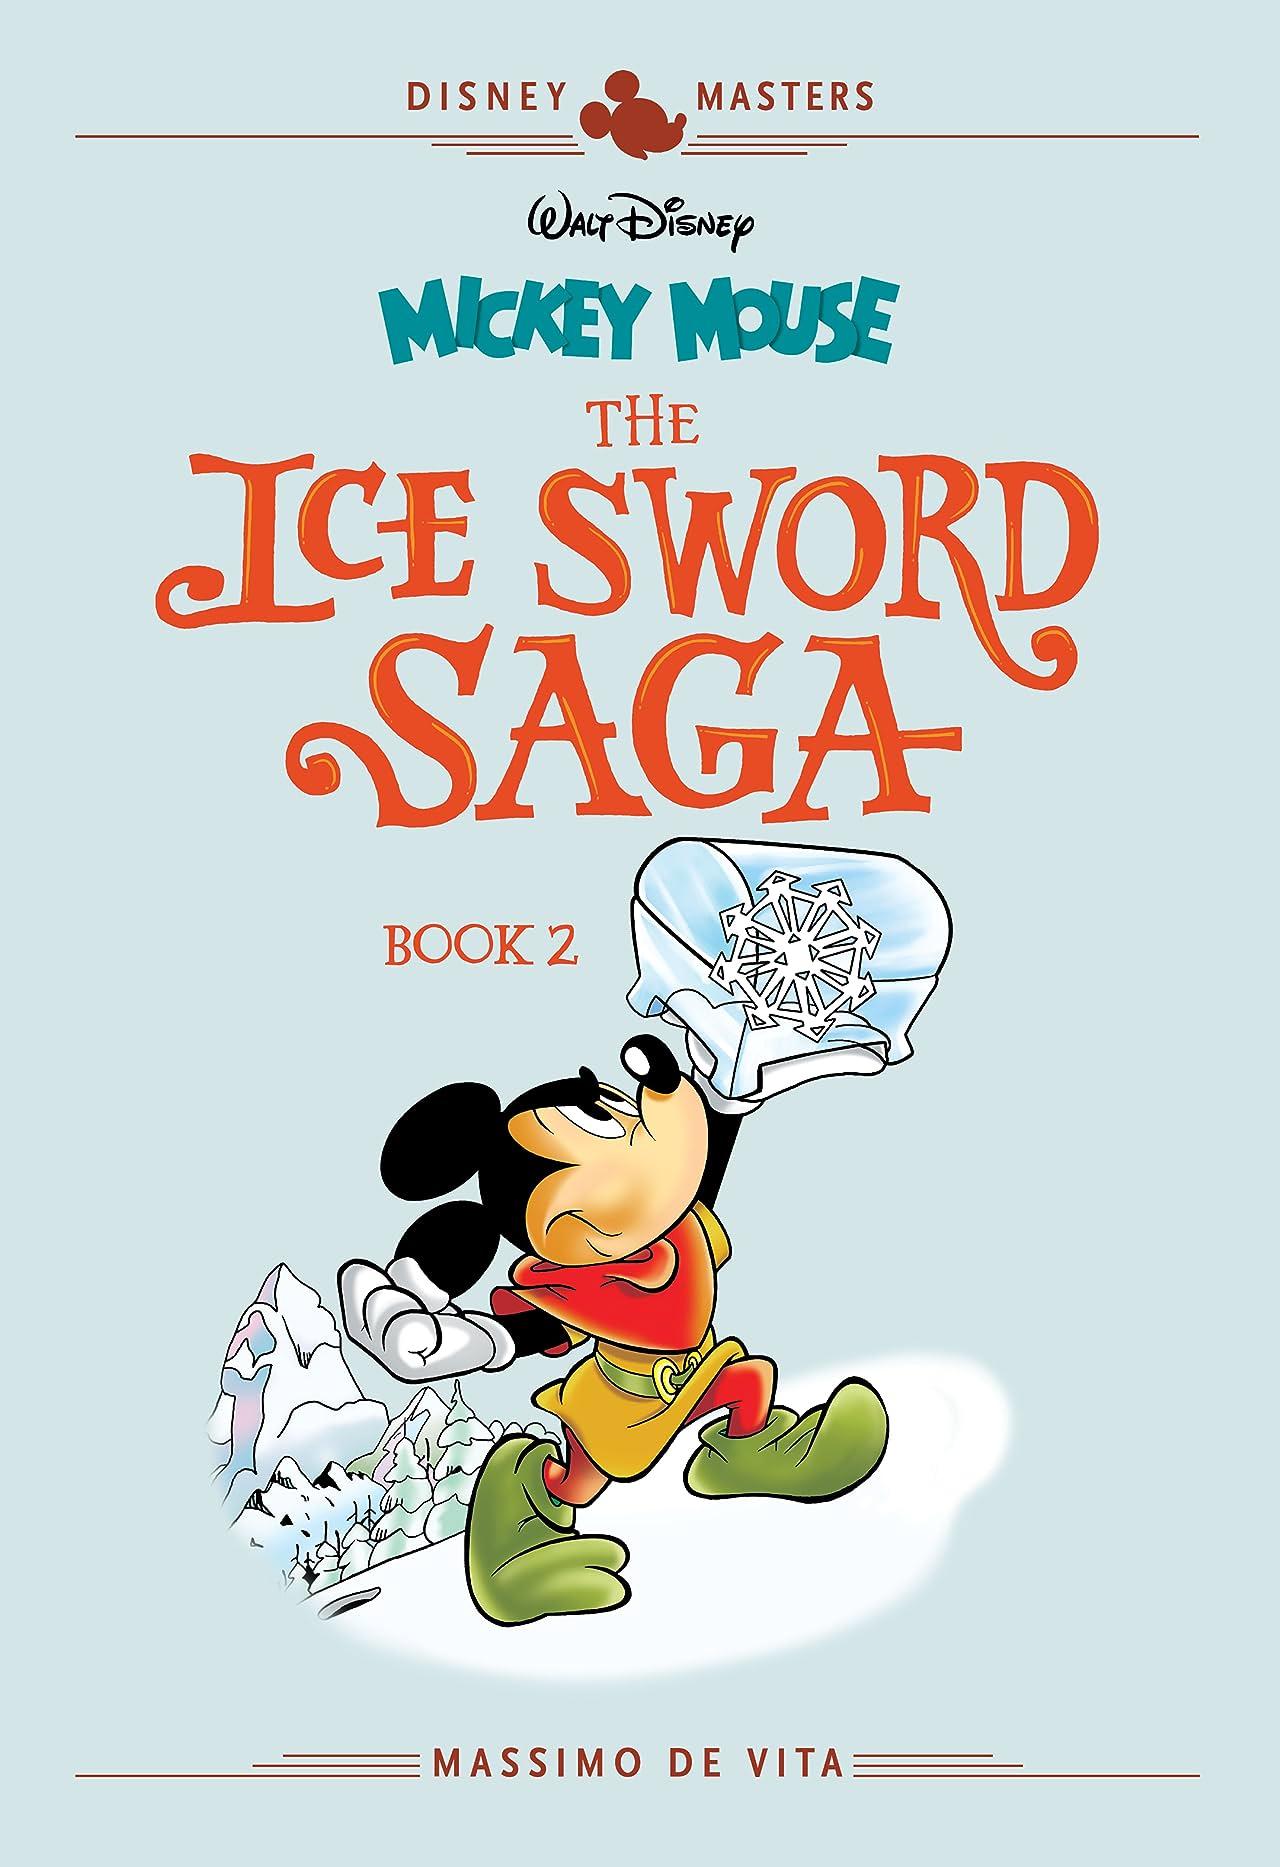 Disney Masters Vol. 11: Mickey Mouse: The Ice Sword Saga Book II